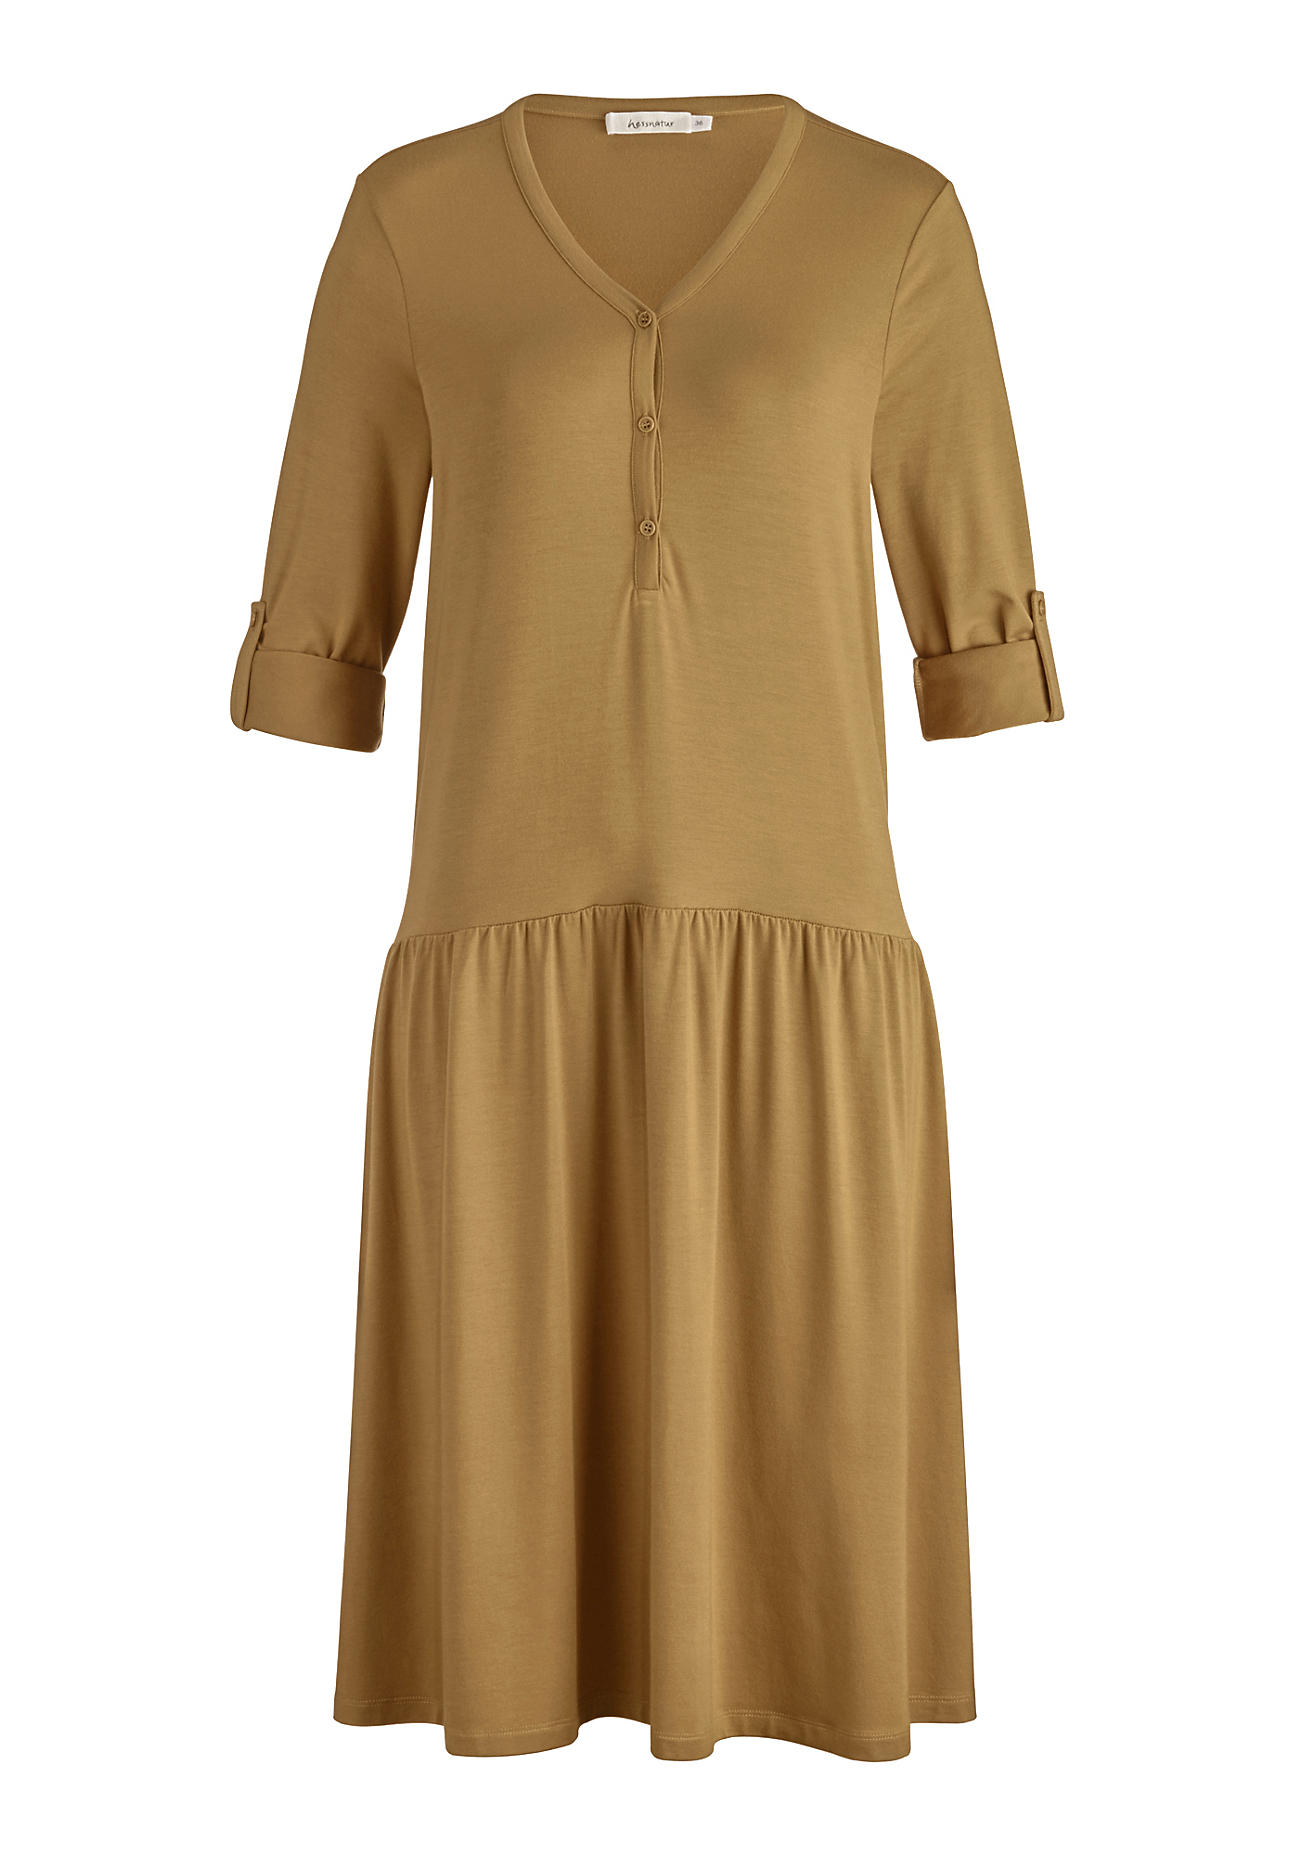 hessnatur Damen Jersey-Kleid aus TENCEL™Modal – braun – Größe 36